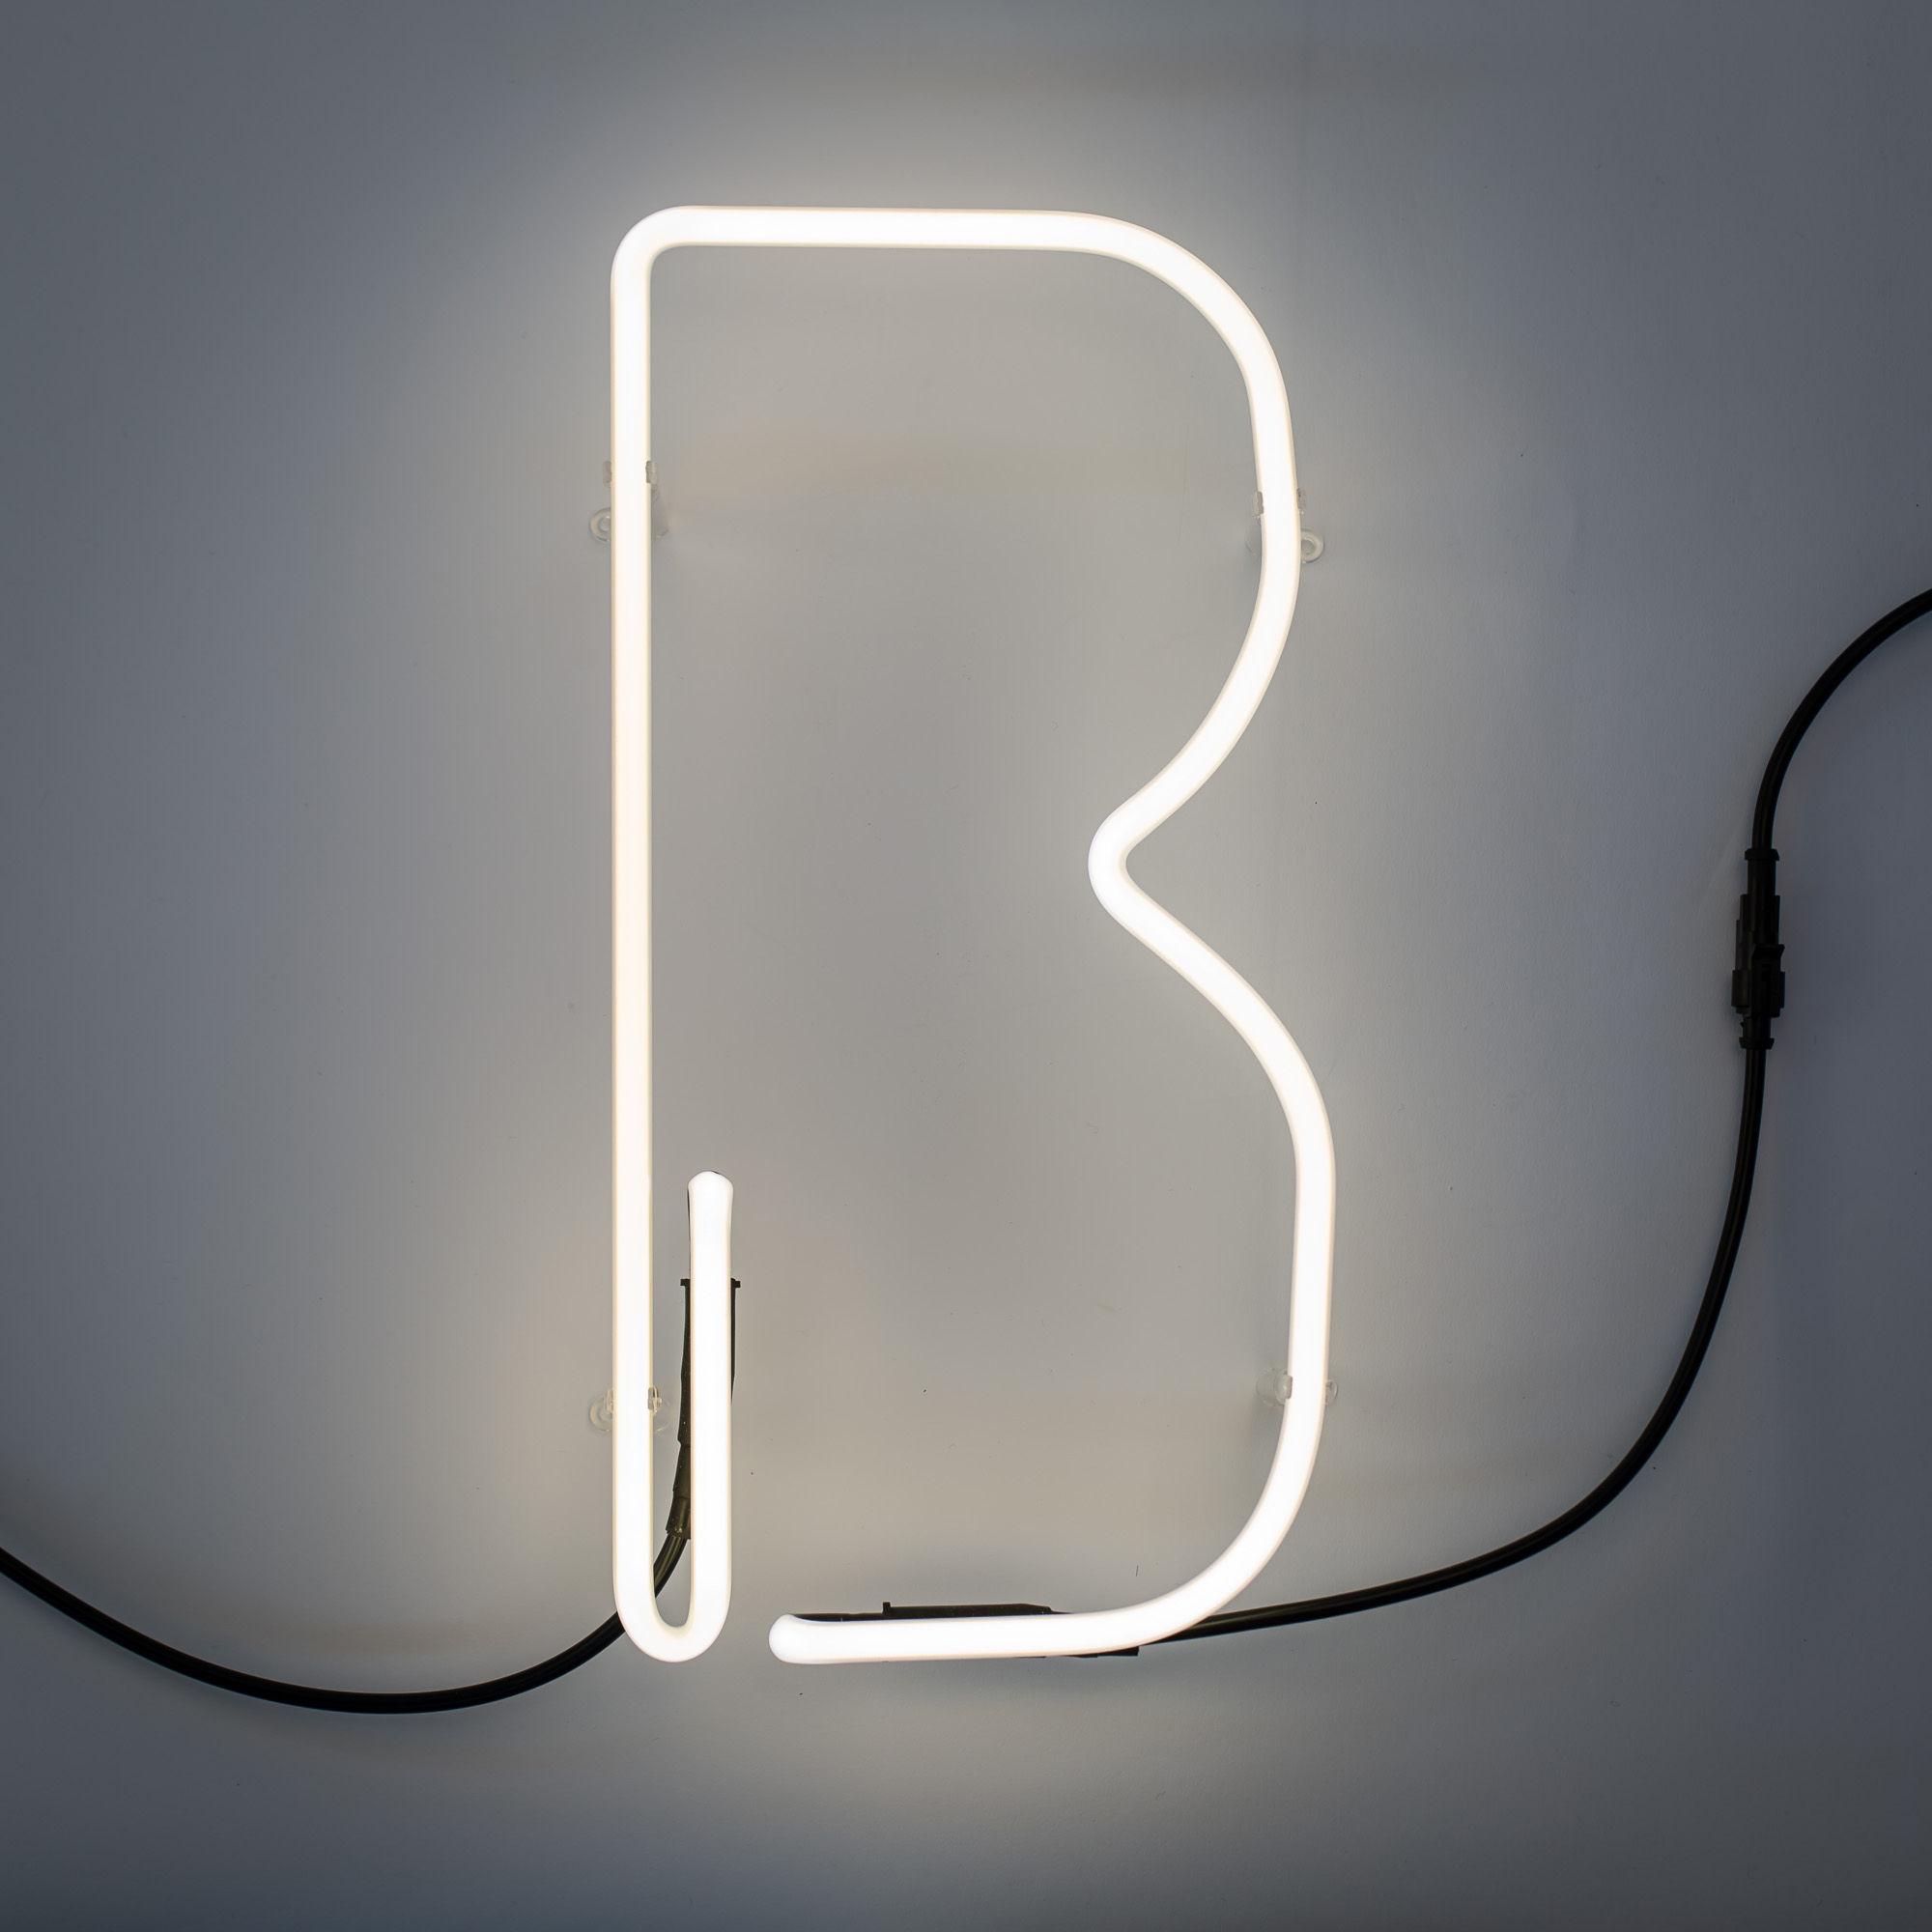 applique n on alphafont lettre b lettre b seletti. Black Bedroom Furniture Sets. Home Design Ideas